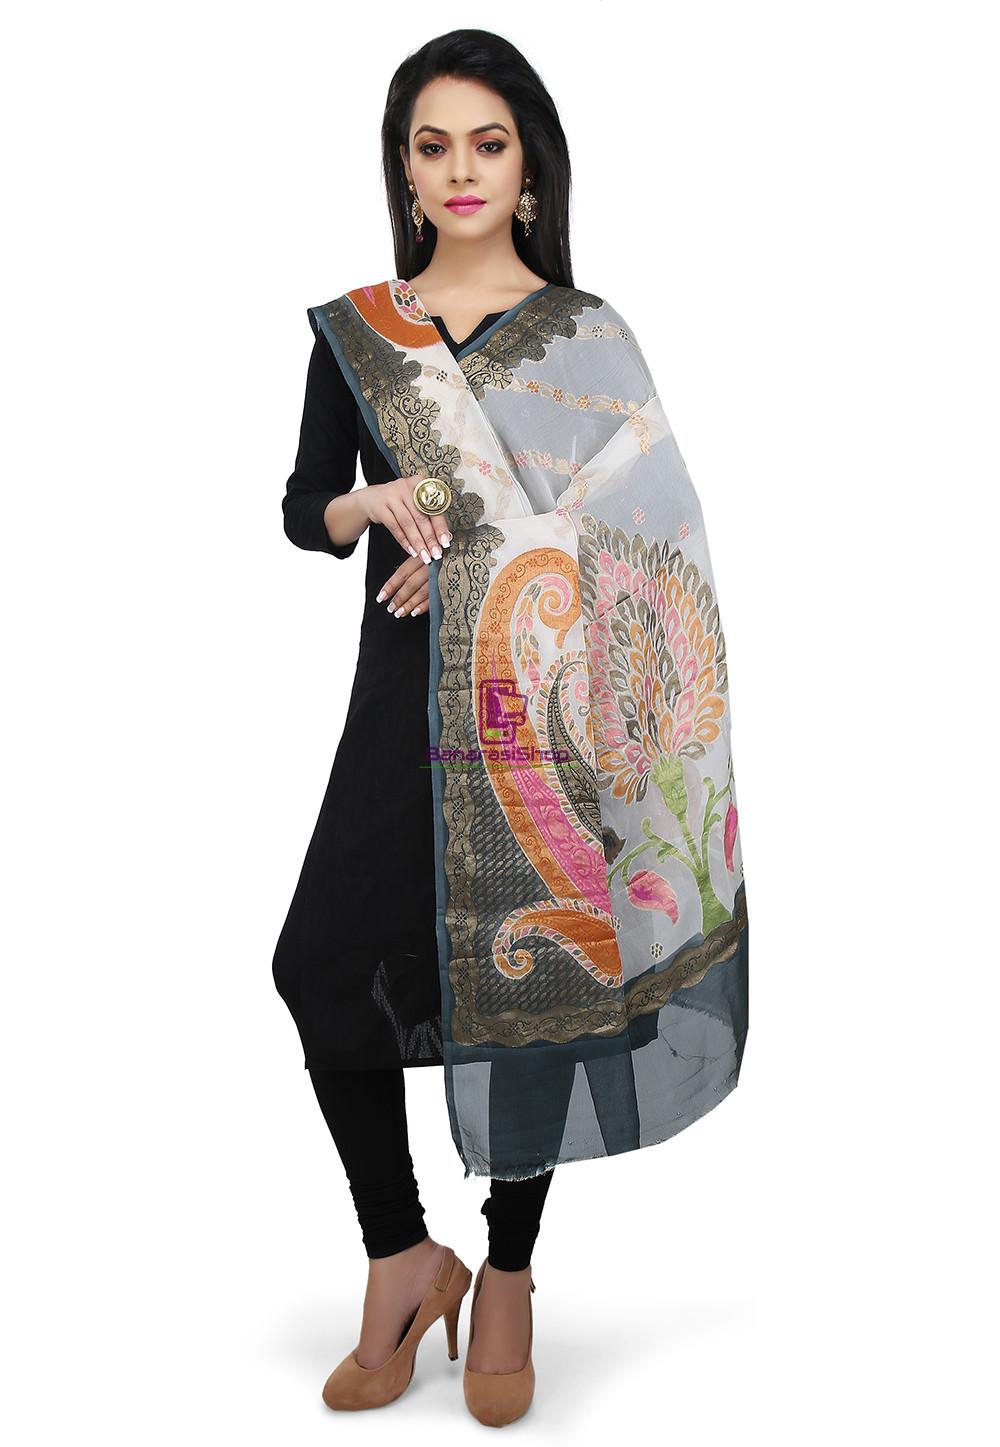 Handloom Banarasi Pure Georgette Dupatta in Off White and Grey 1